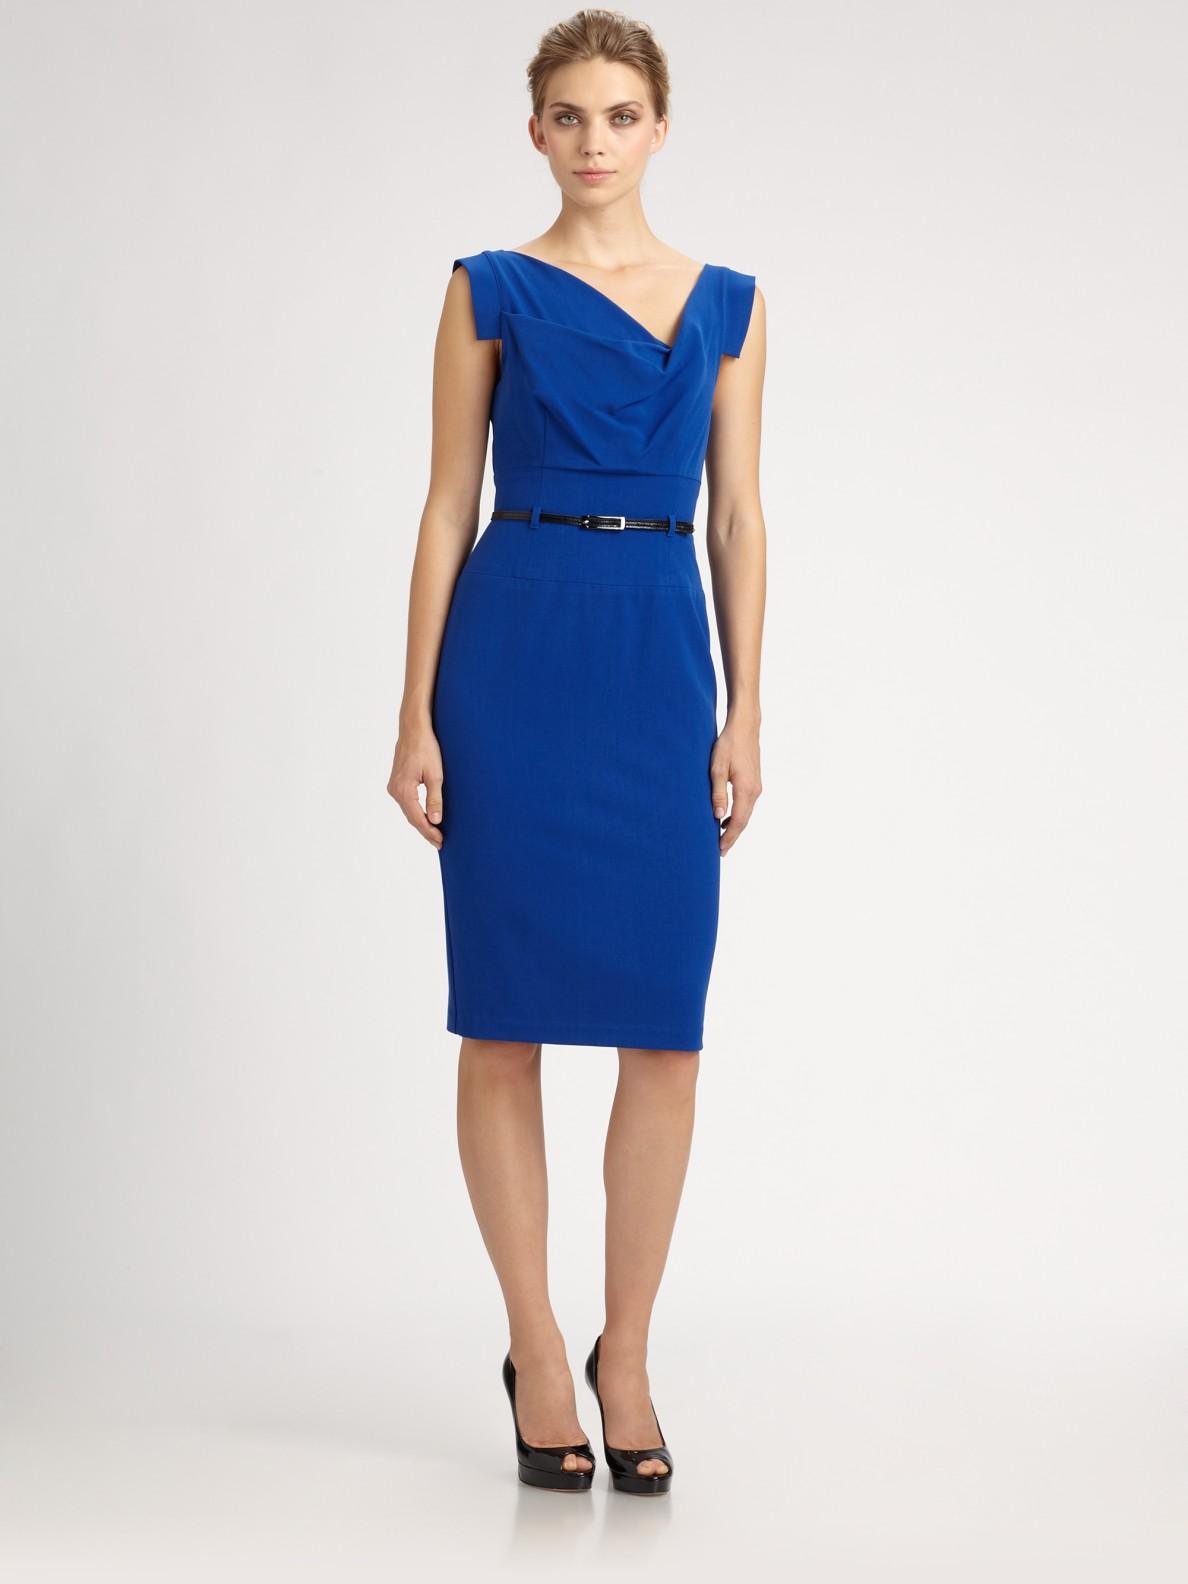 Black Halo Jackie O Dress In Blue Lyst